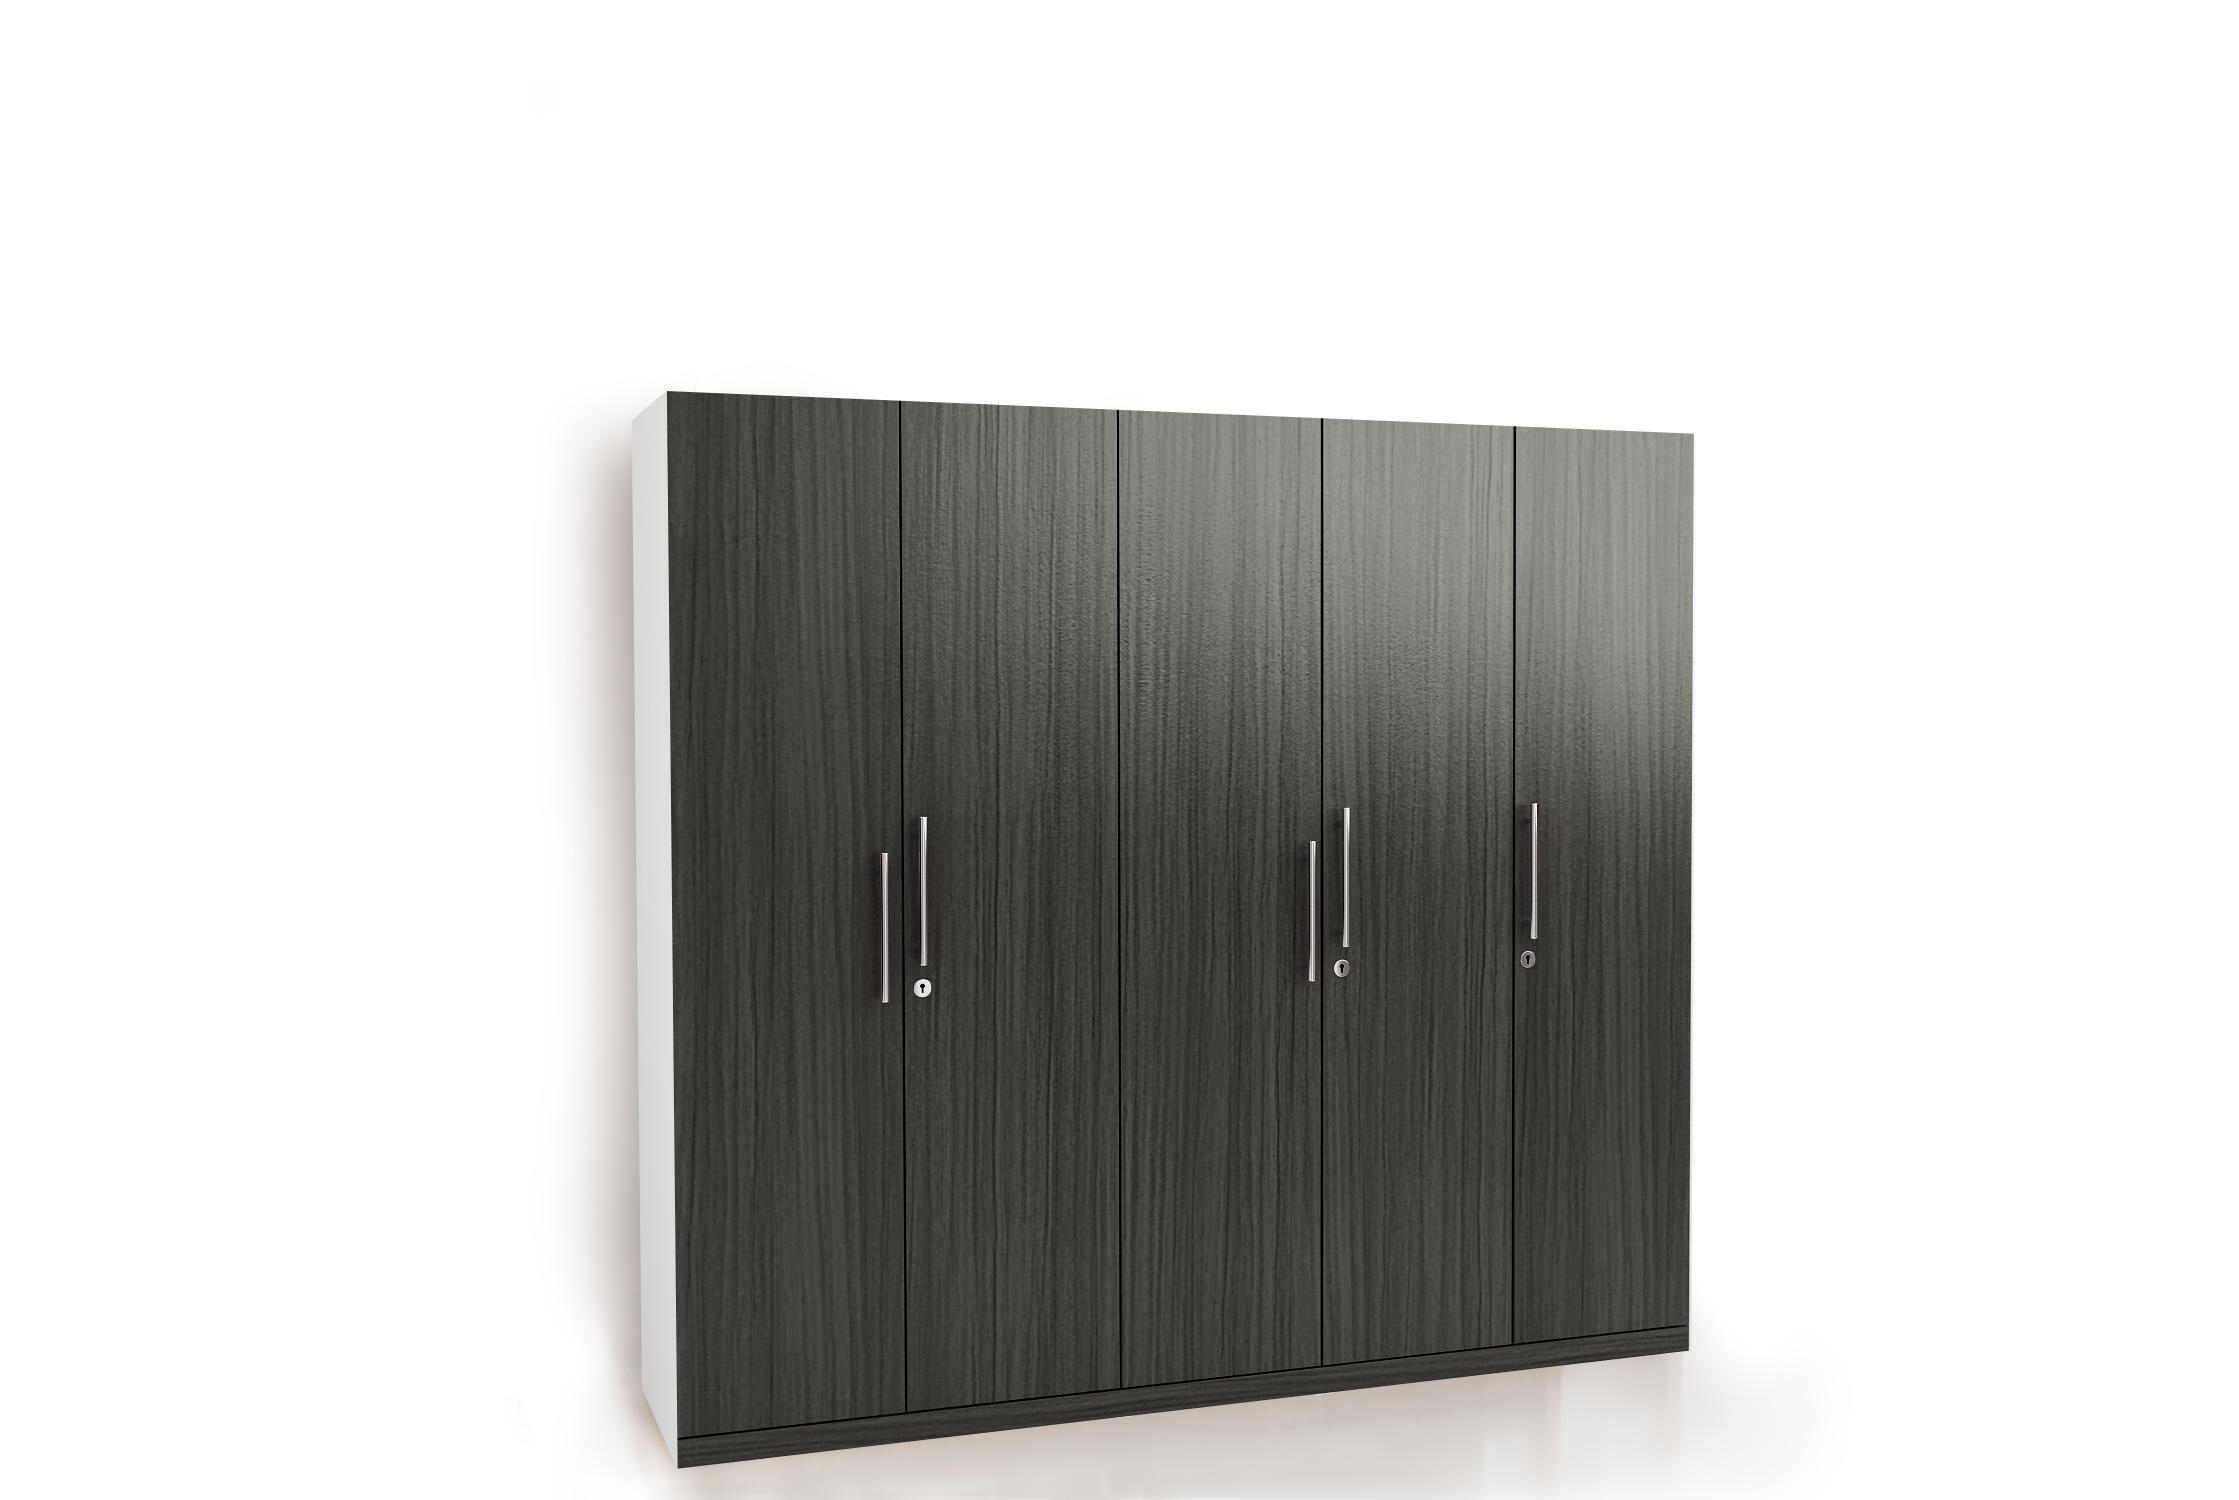 Vinderup Garderob 3 Vrati 3 Chekmed Byal Jysk Locker Storage Bedroom Cupboard Designs Tall Cabinet Storage